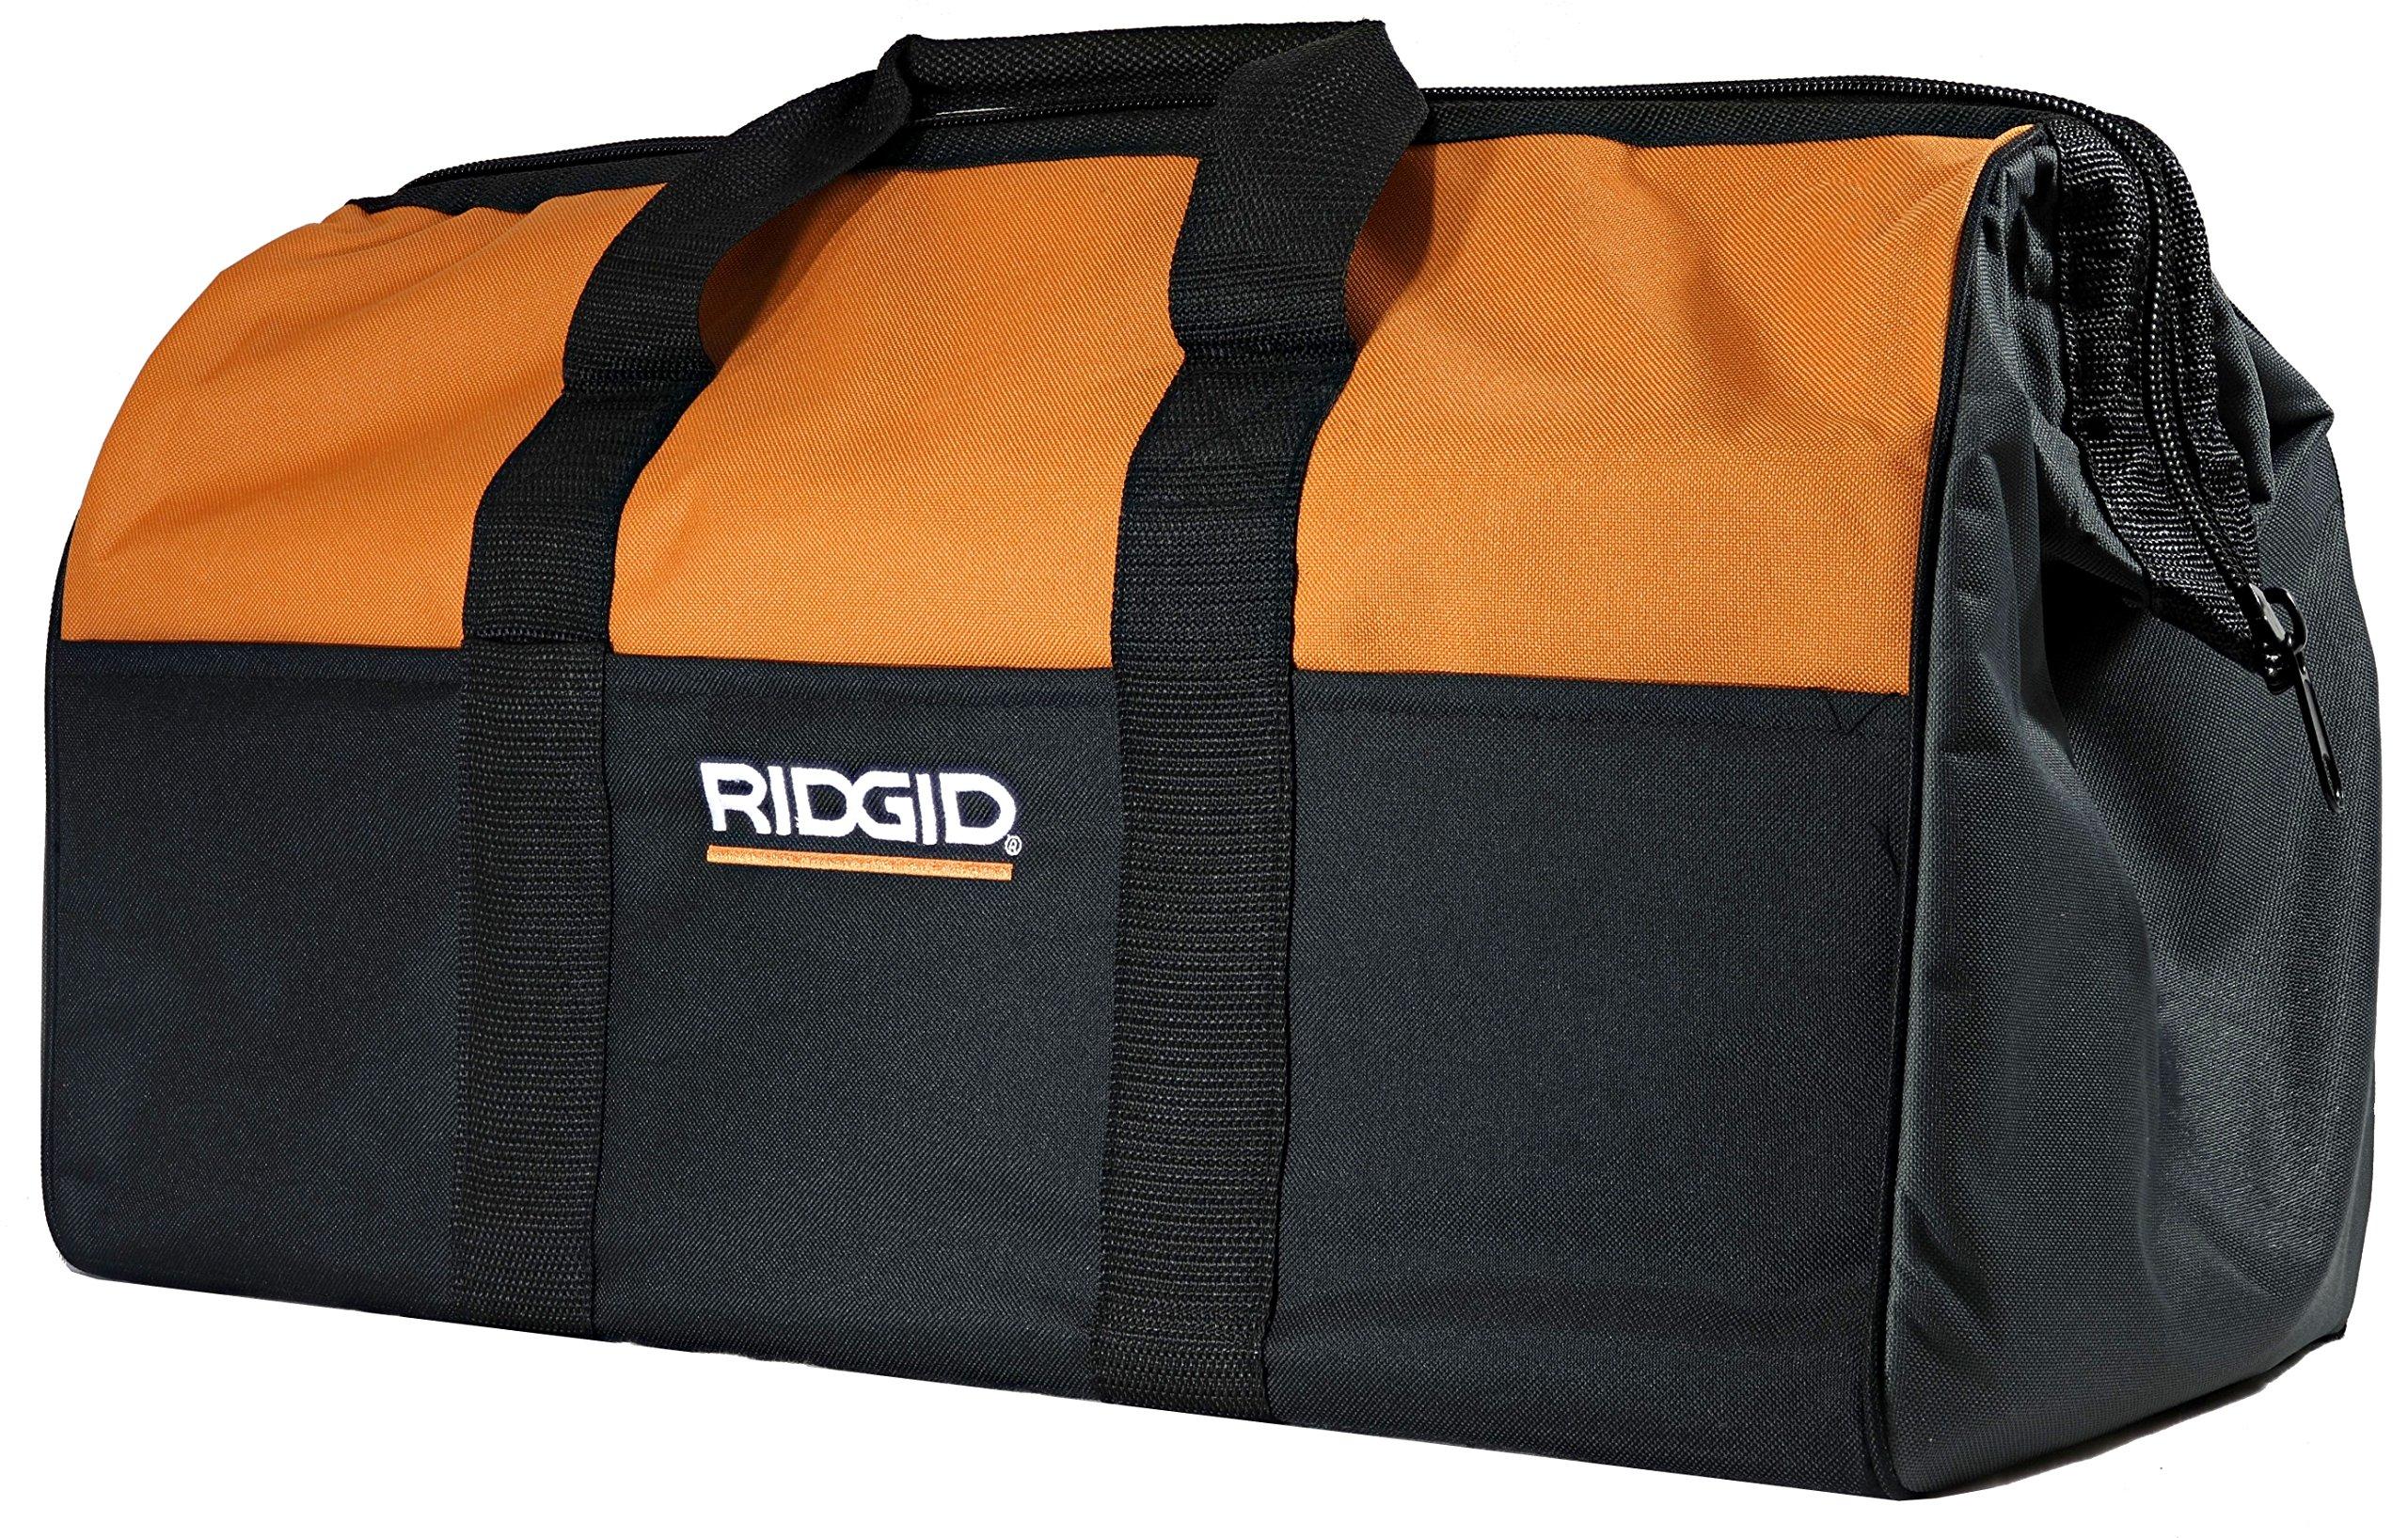 "Ridgid Genuine OEM Canvas Power Tool Contractor's Bag (22"" x 11"" x 10"")"